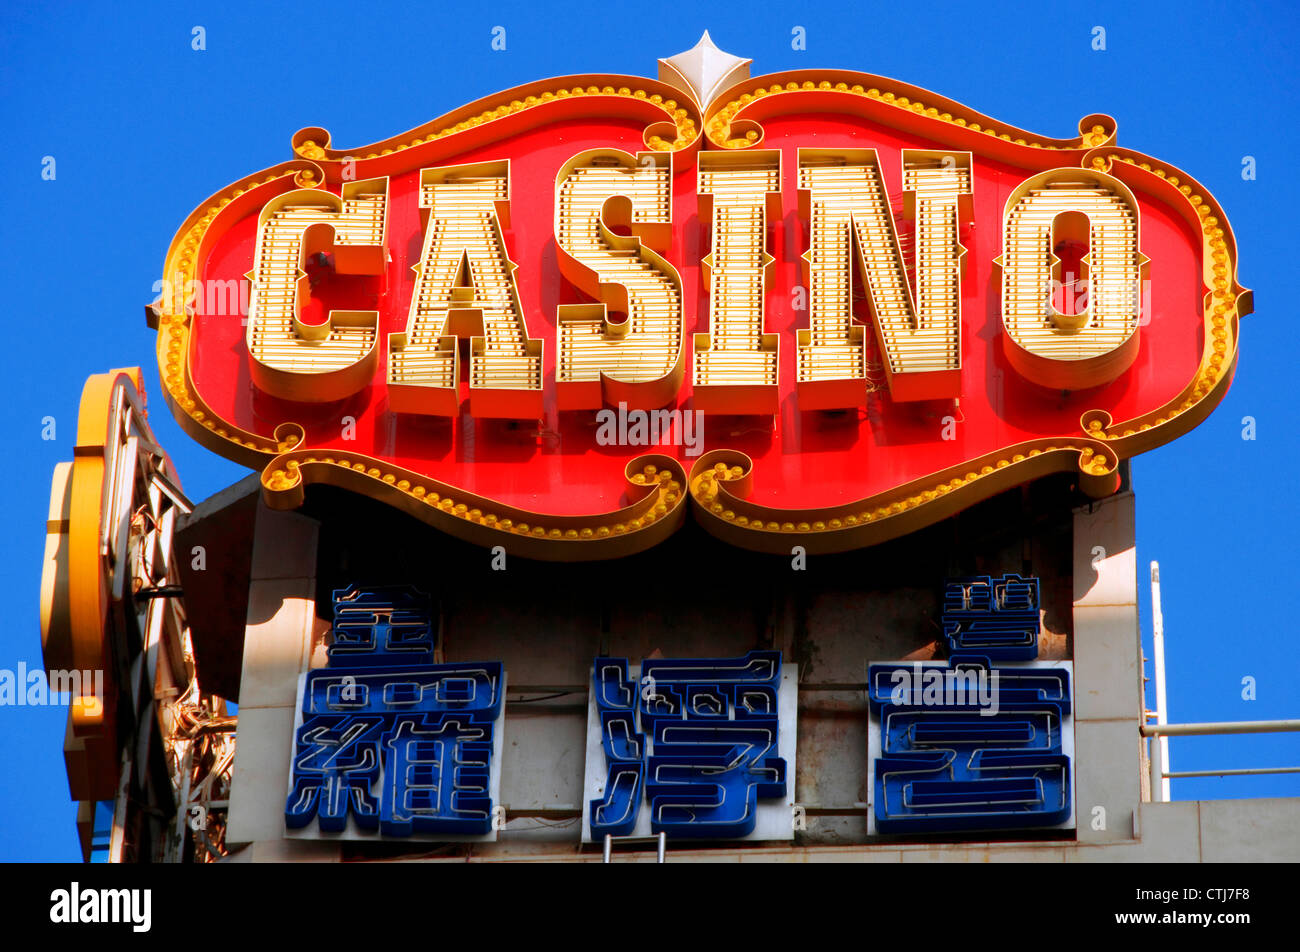 Casino chino signo, Macao, China. Imagen De Stock